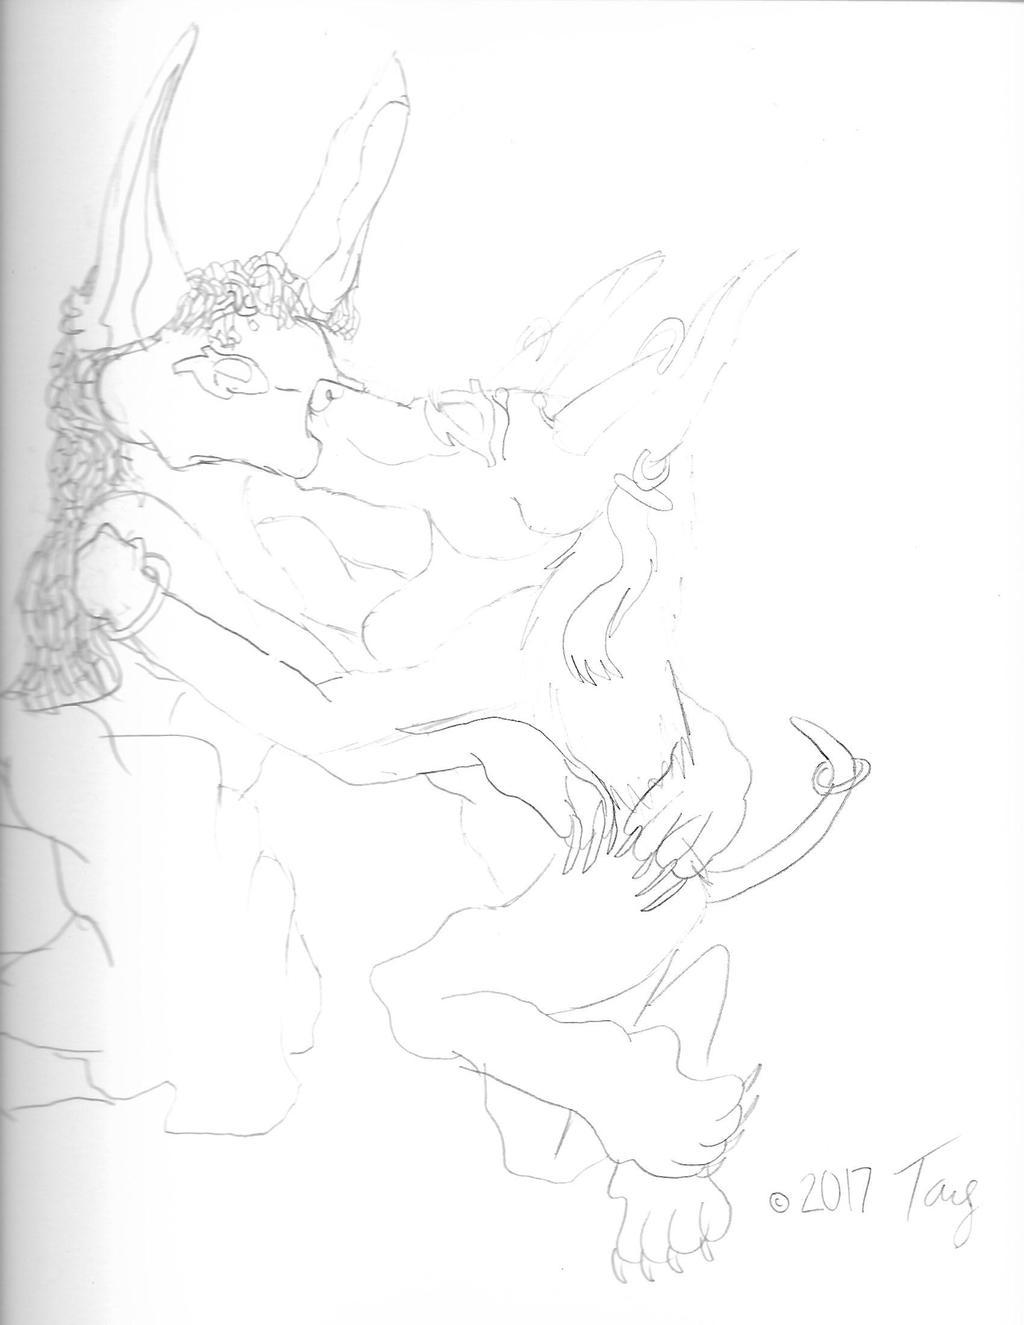 Featured image: Kiss (Anubis x Sanura)